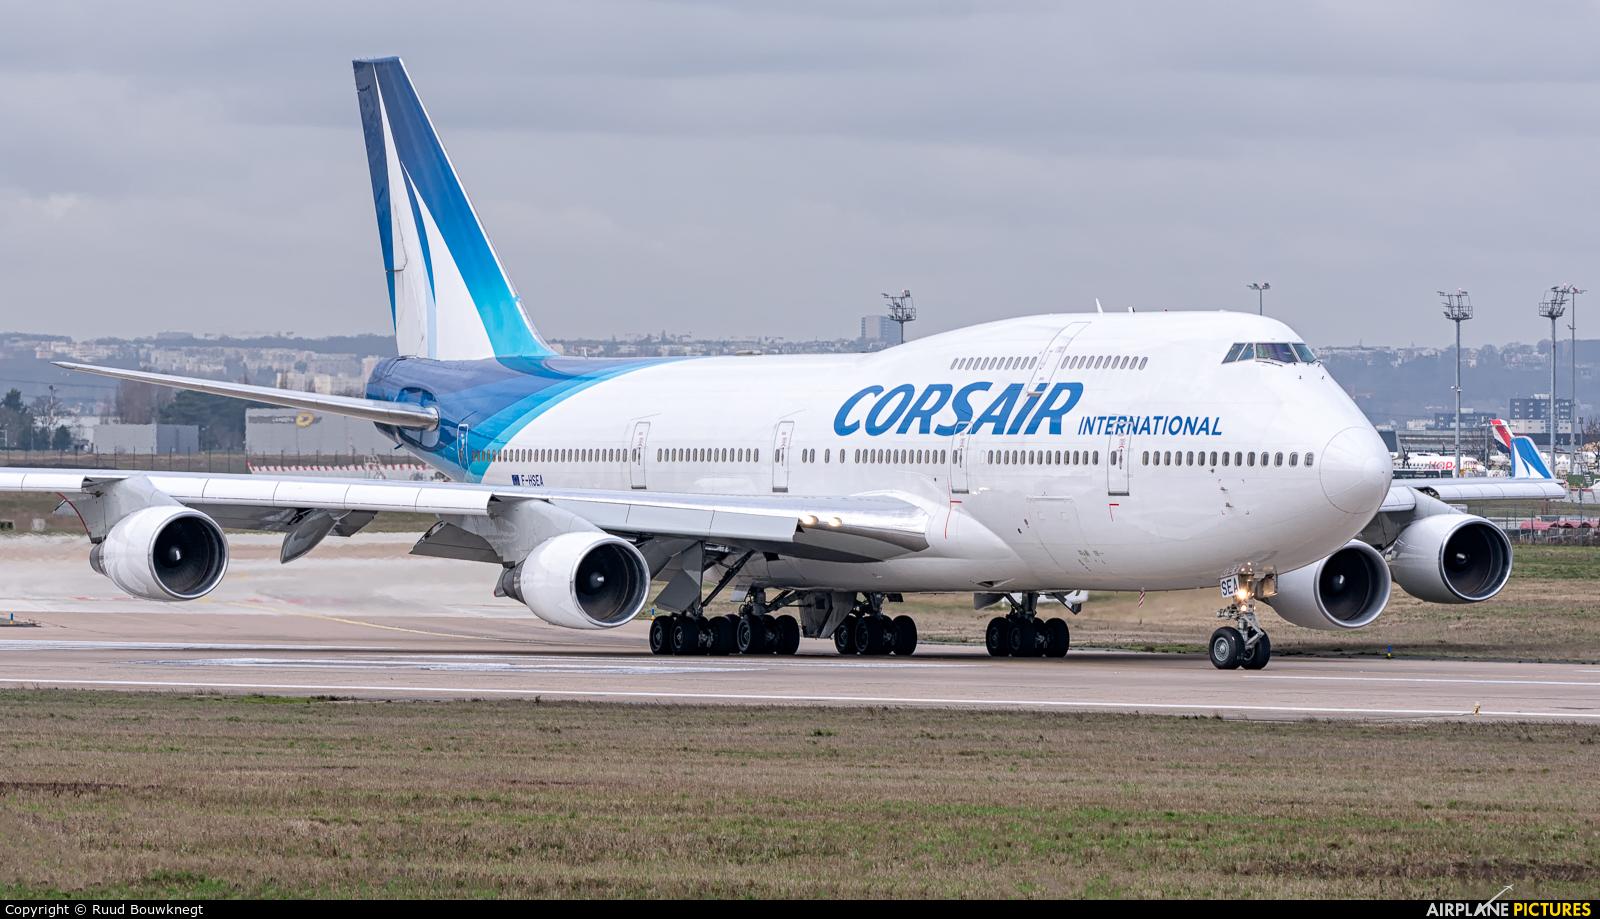 Corsair / Corsair Intl F-HSEA aircraft at Paris - Orly